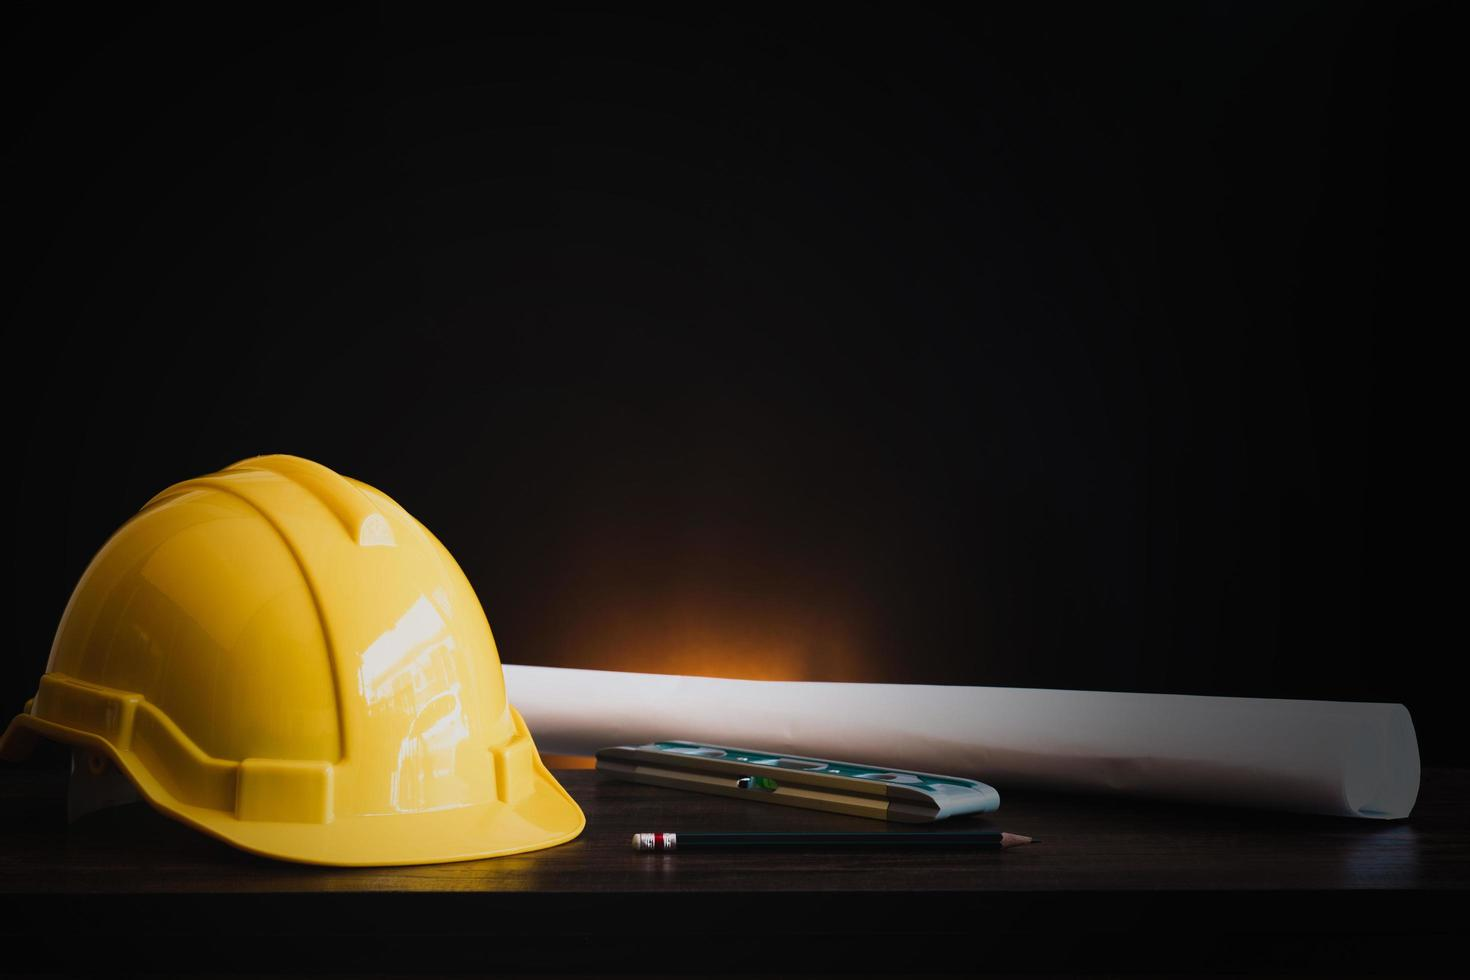 Engineer's tools  with helmet photo